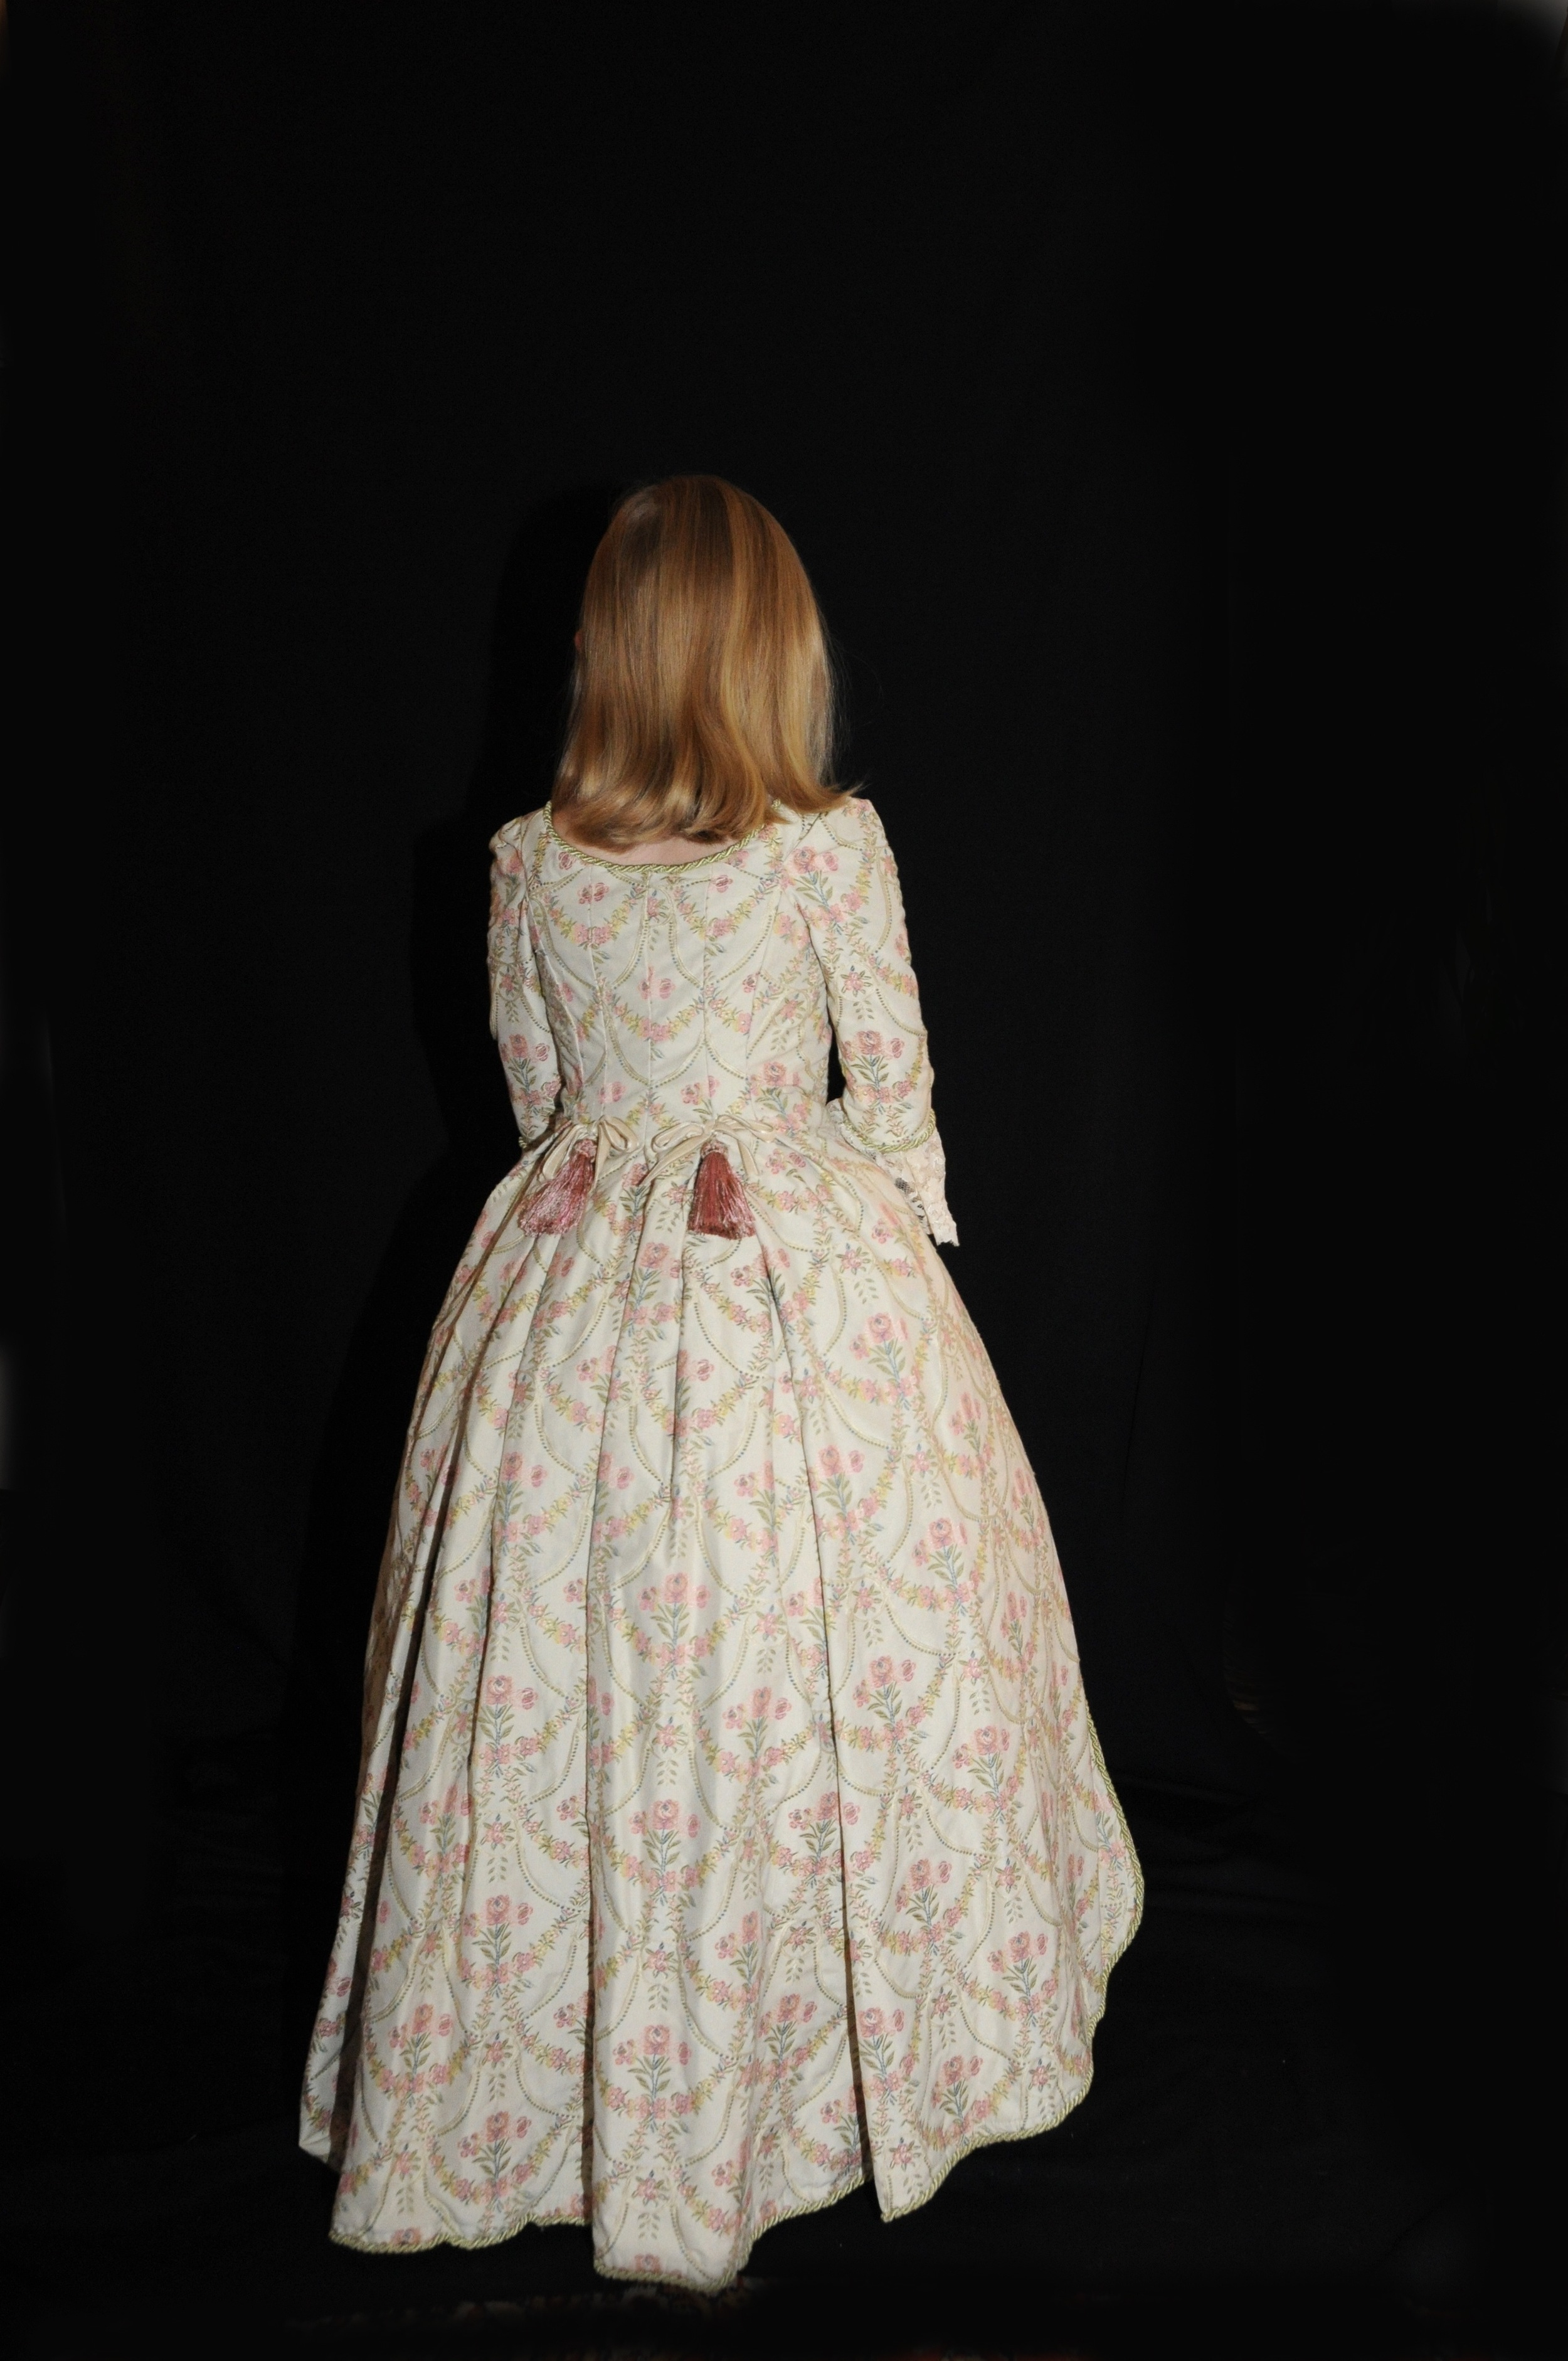 Robe XVIIIe petite fille en tissu broché, création Agnès Szabelewski